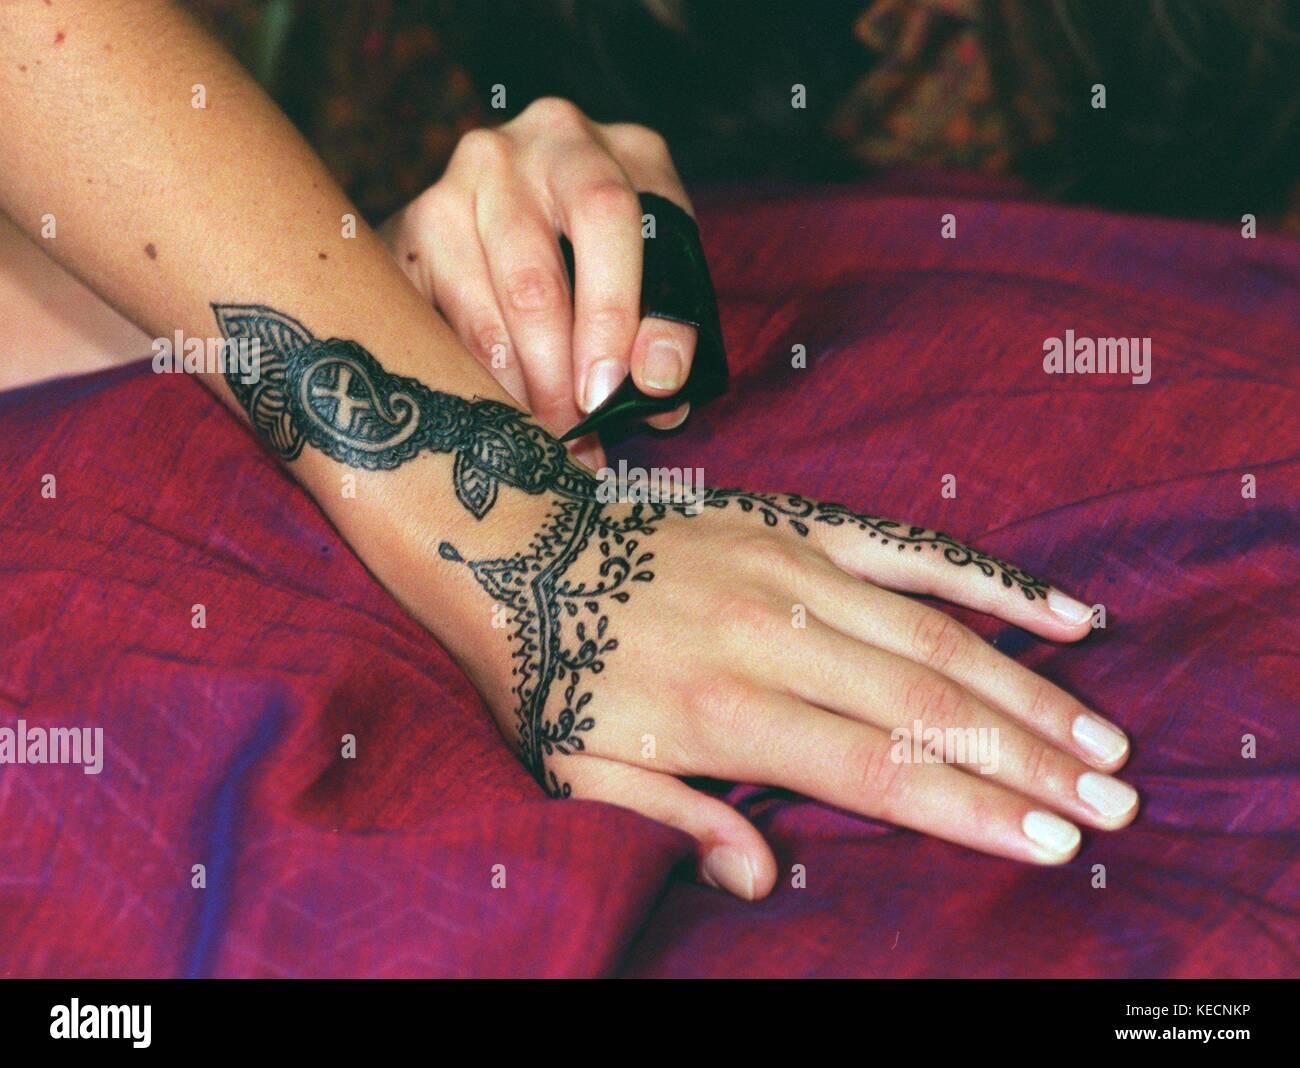 Indian Tattoo Art Mehndi Becomes Increasingly Popular In Europe